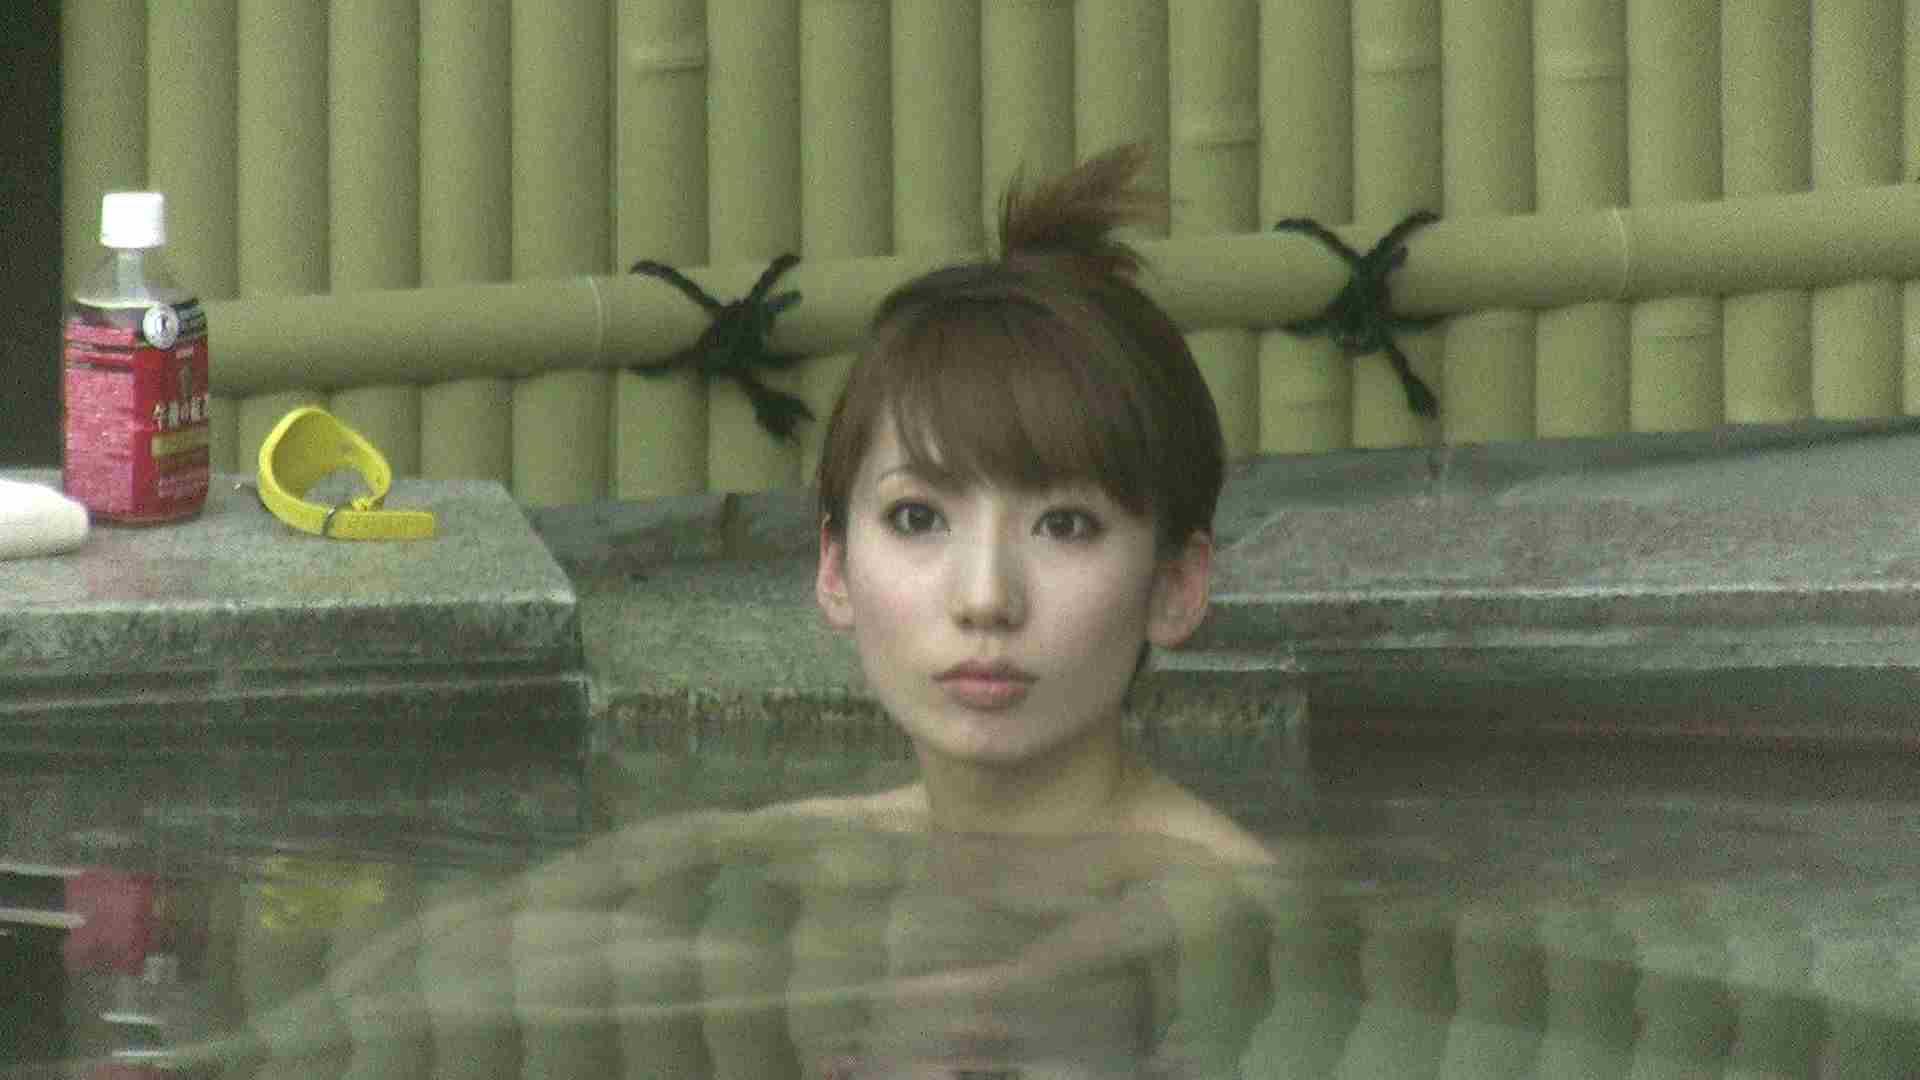 Aquaな露天風呂Vol.208 HなOL   盗撮  101pic 35